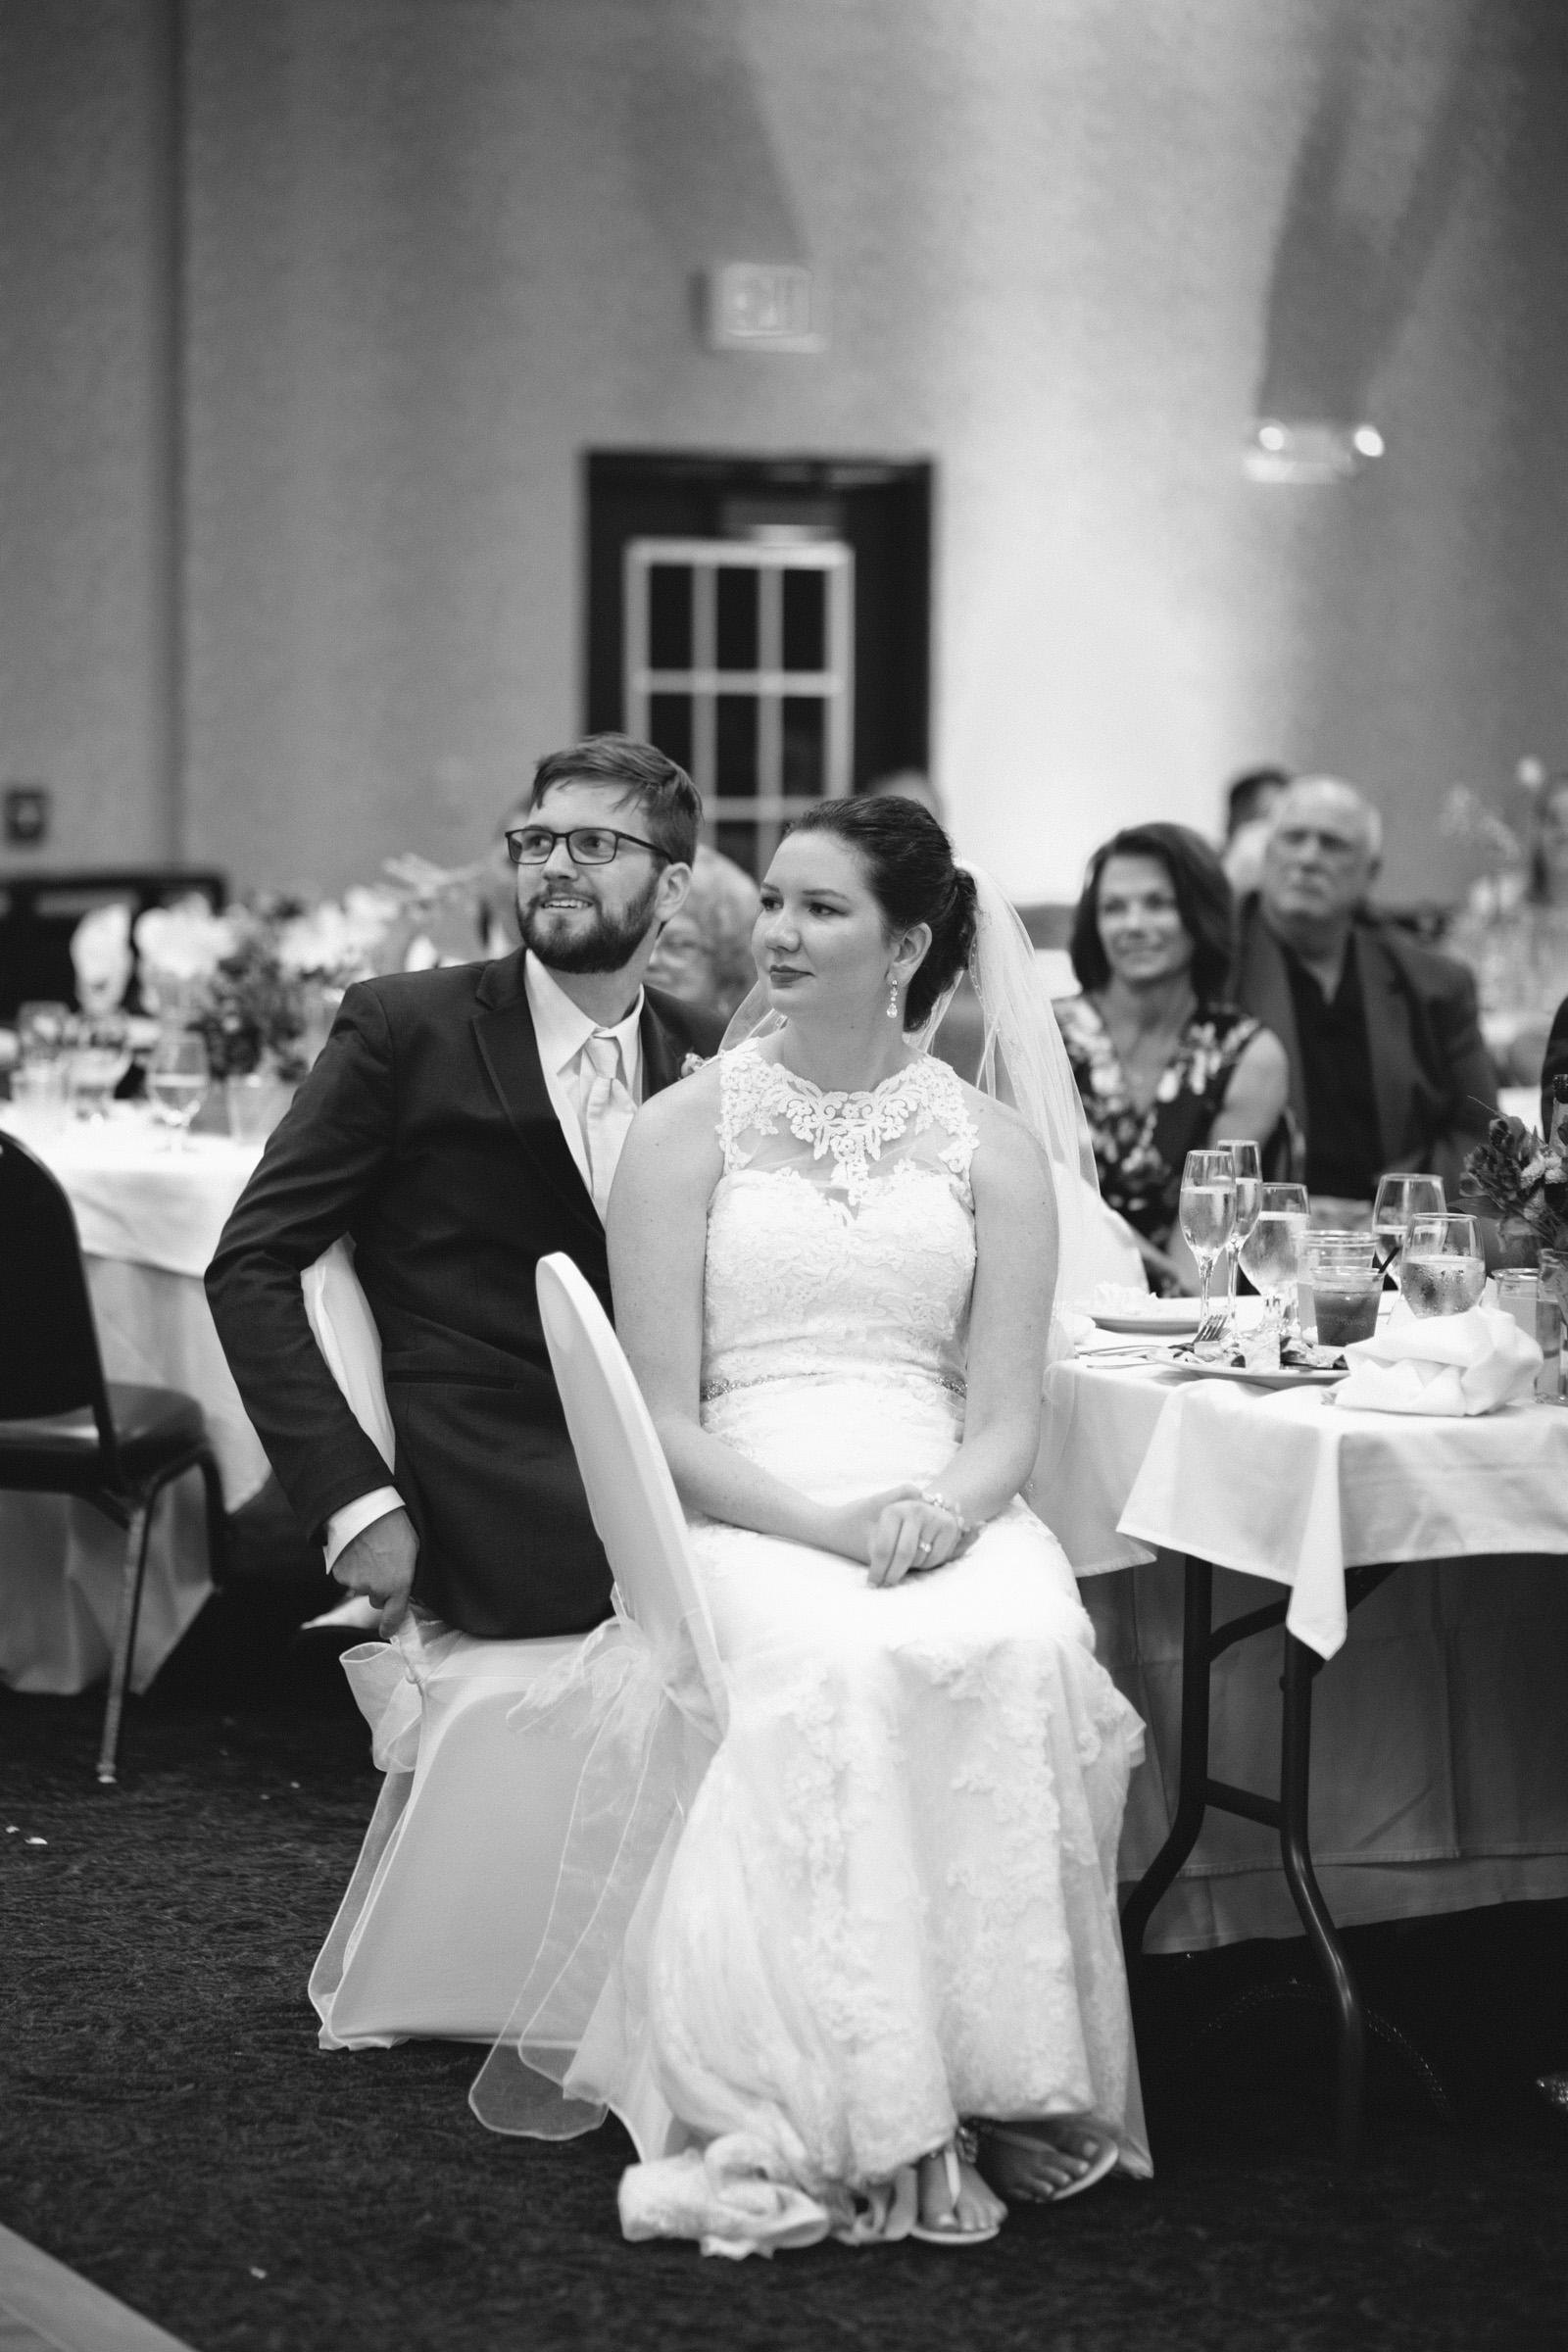 johnston_iowa_wedding_photographers-46.jpg